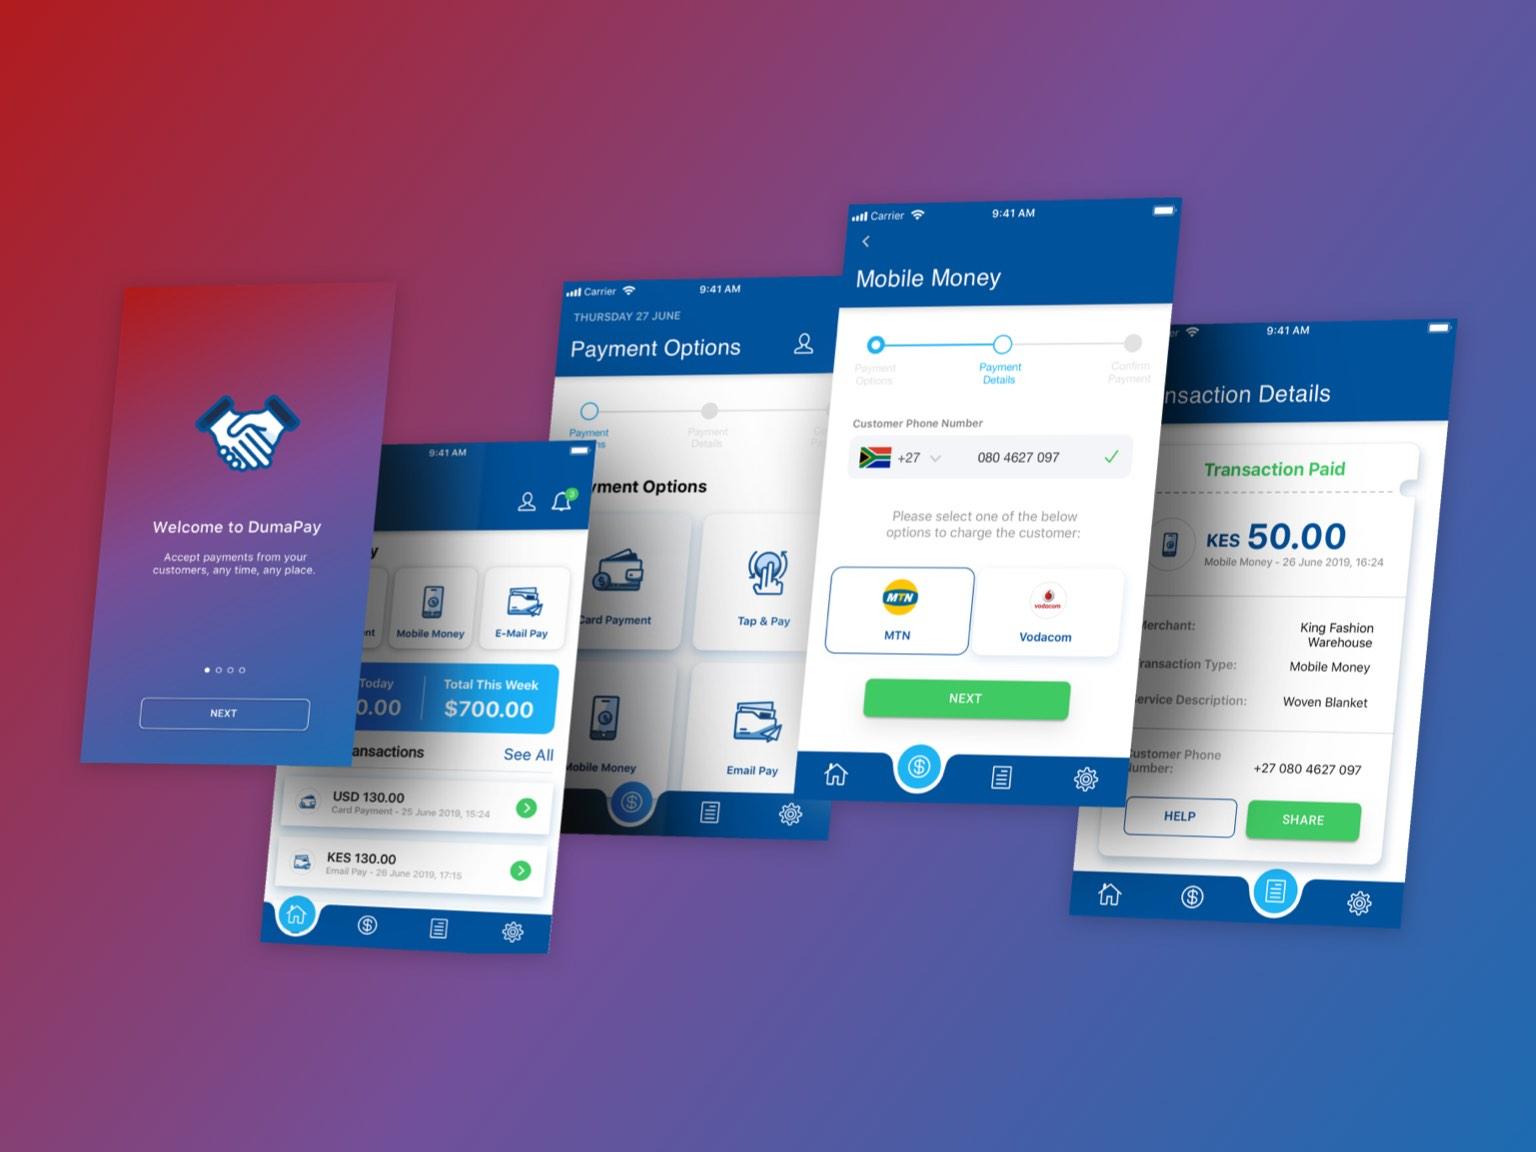 DumaPay app case study